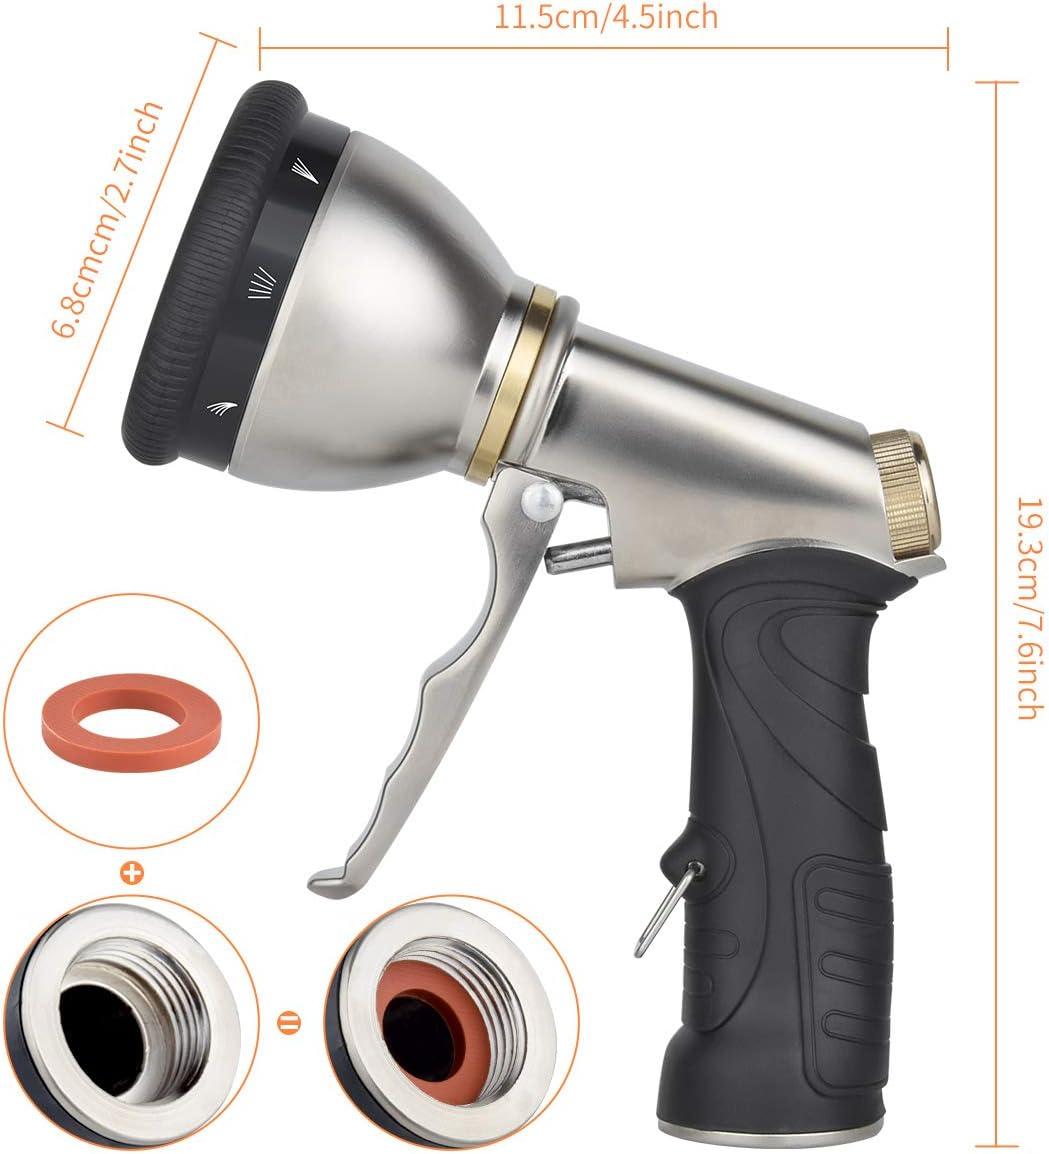 Garden Hose Trigger Nozzle Water Sprayer Metal Heavy Duty Lawns Tools 6 Way Cars